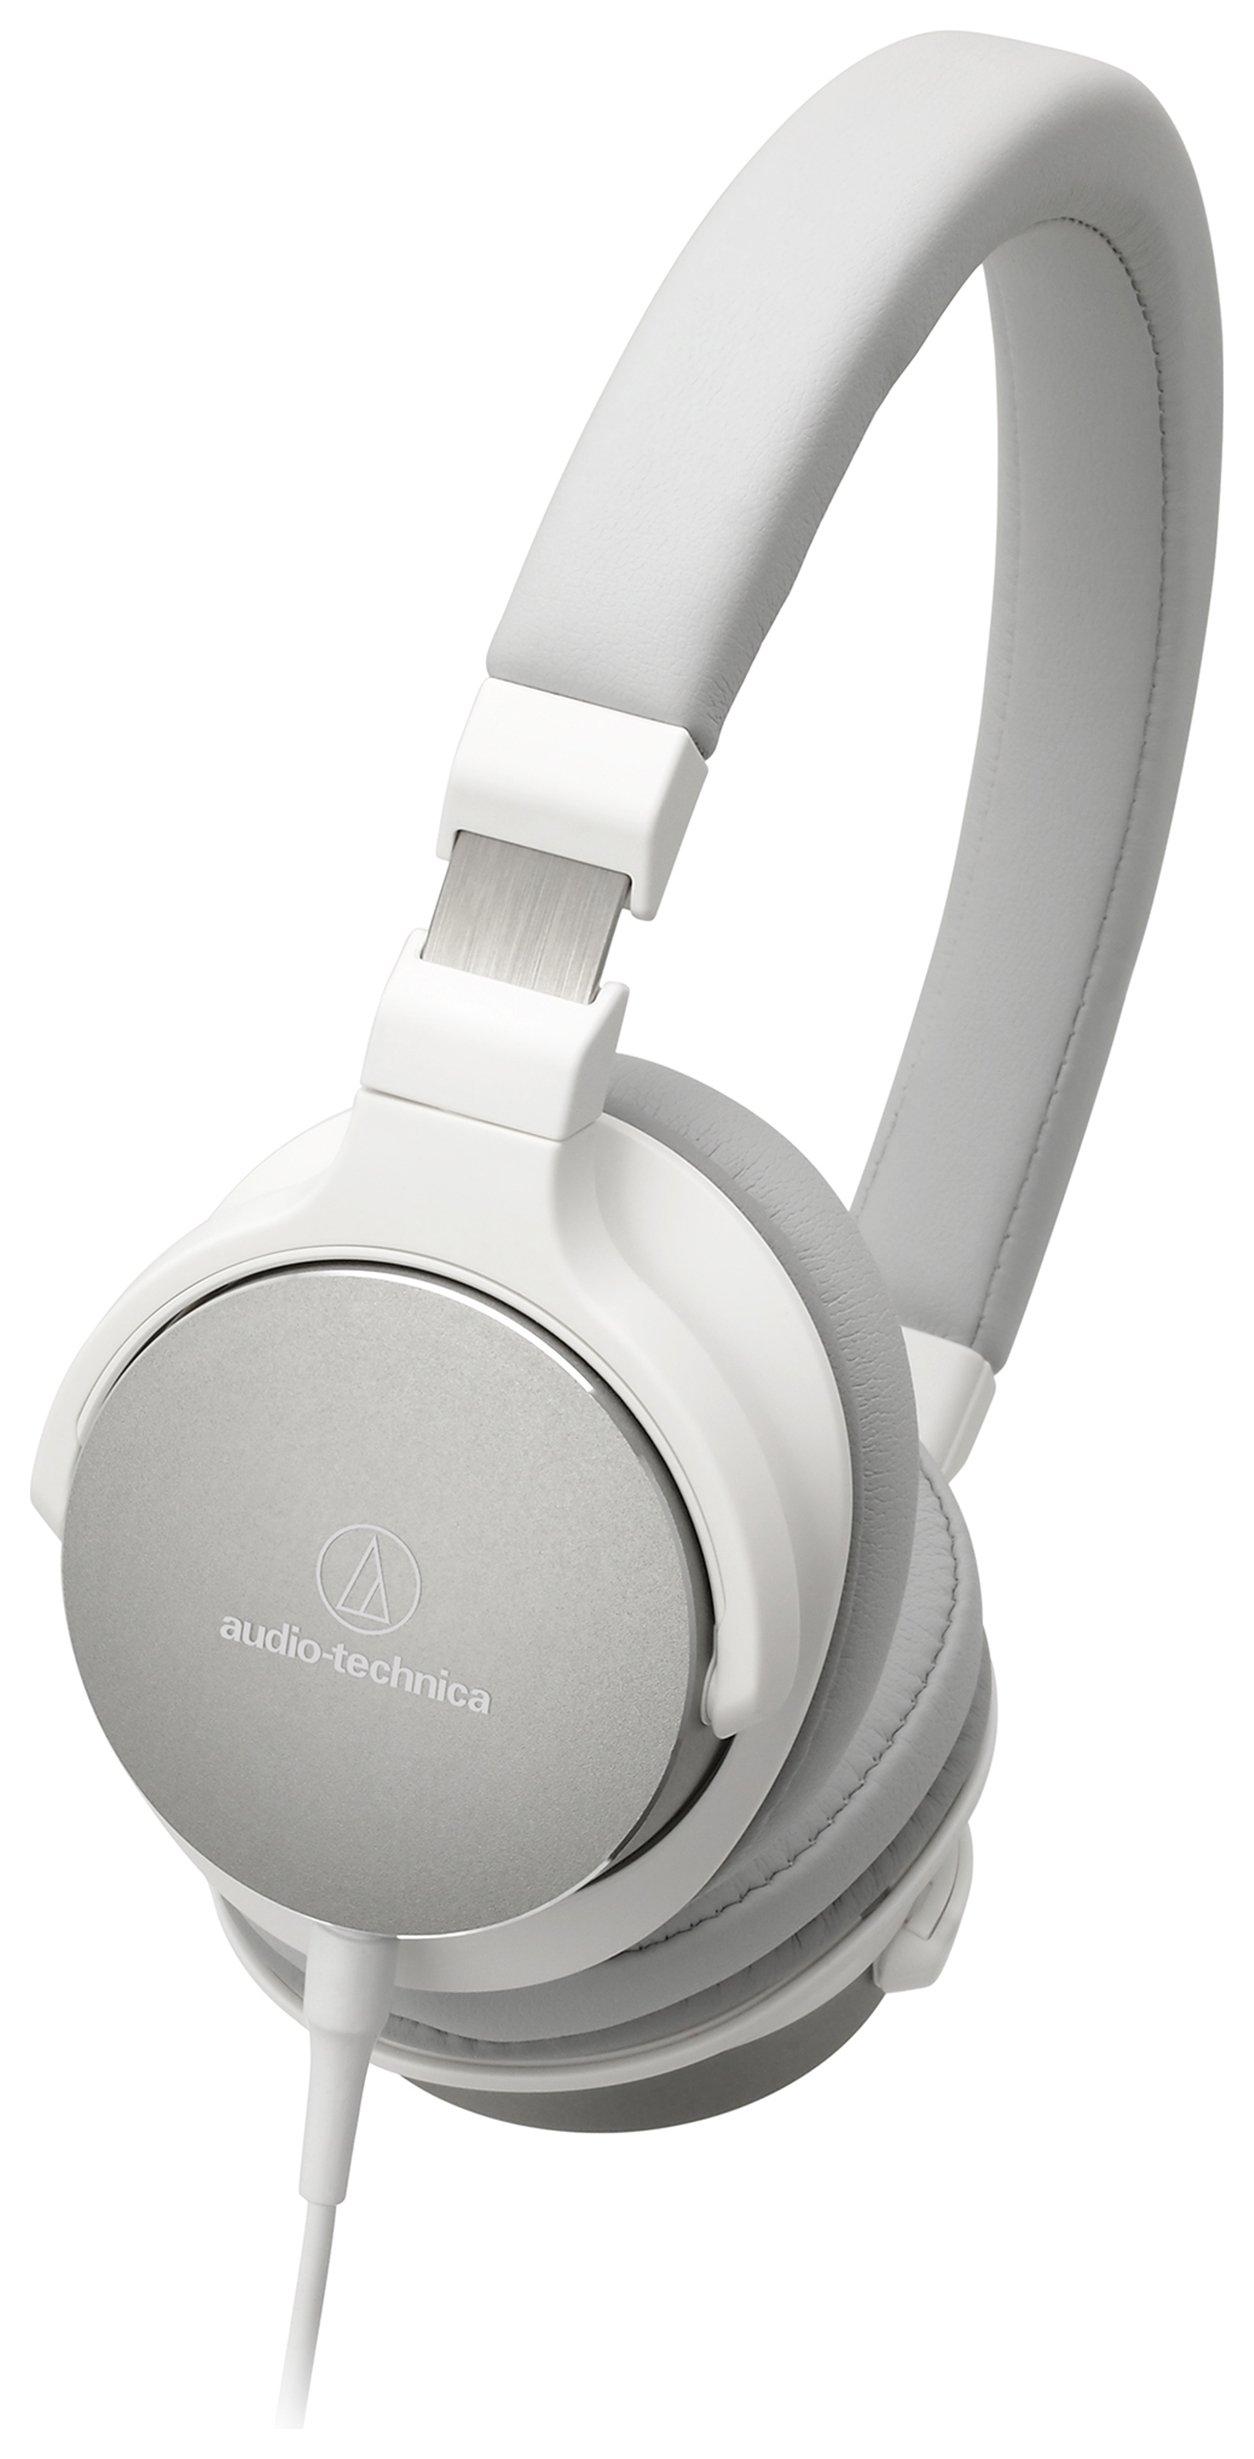 Audio Technica Audio Technica ATH-SR5 On-Ear Headphones - White.